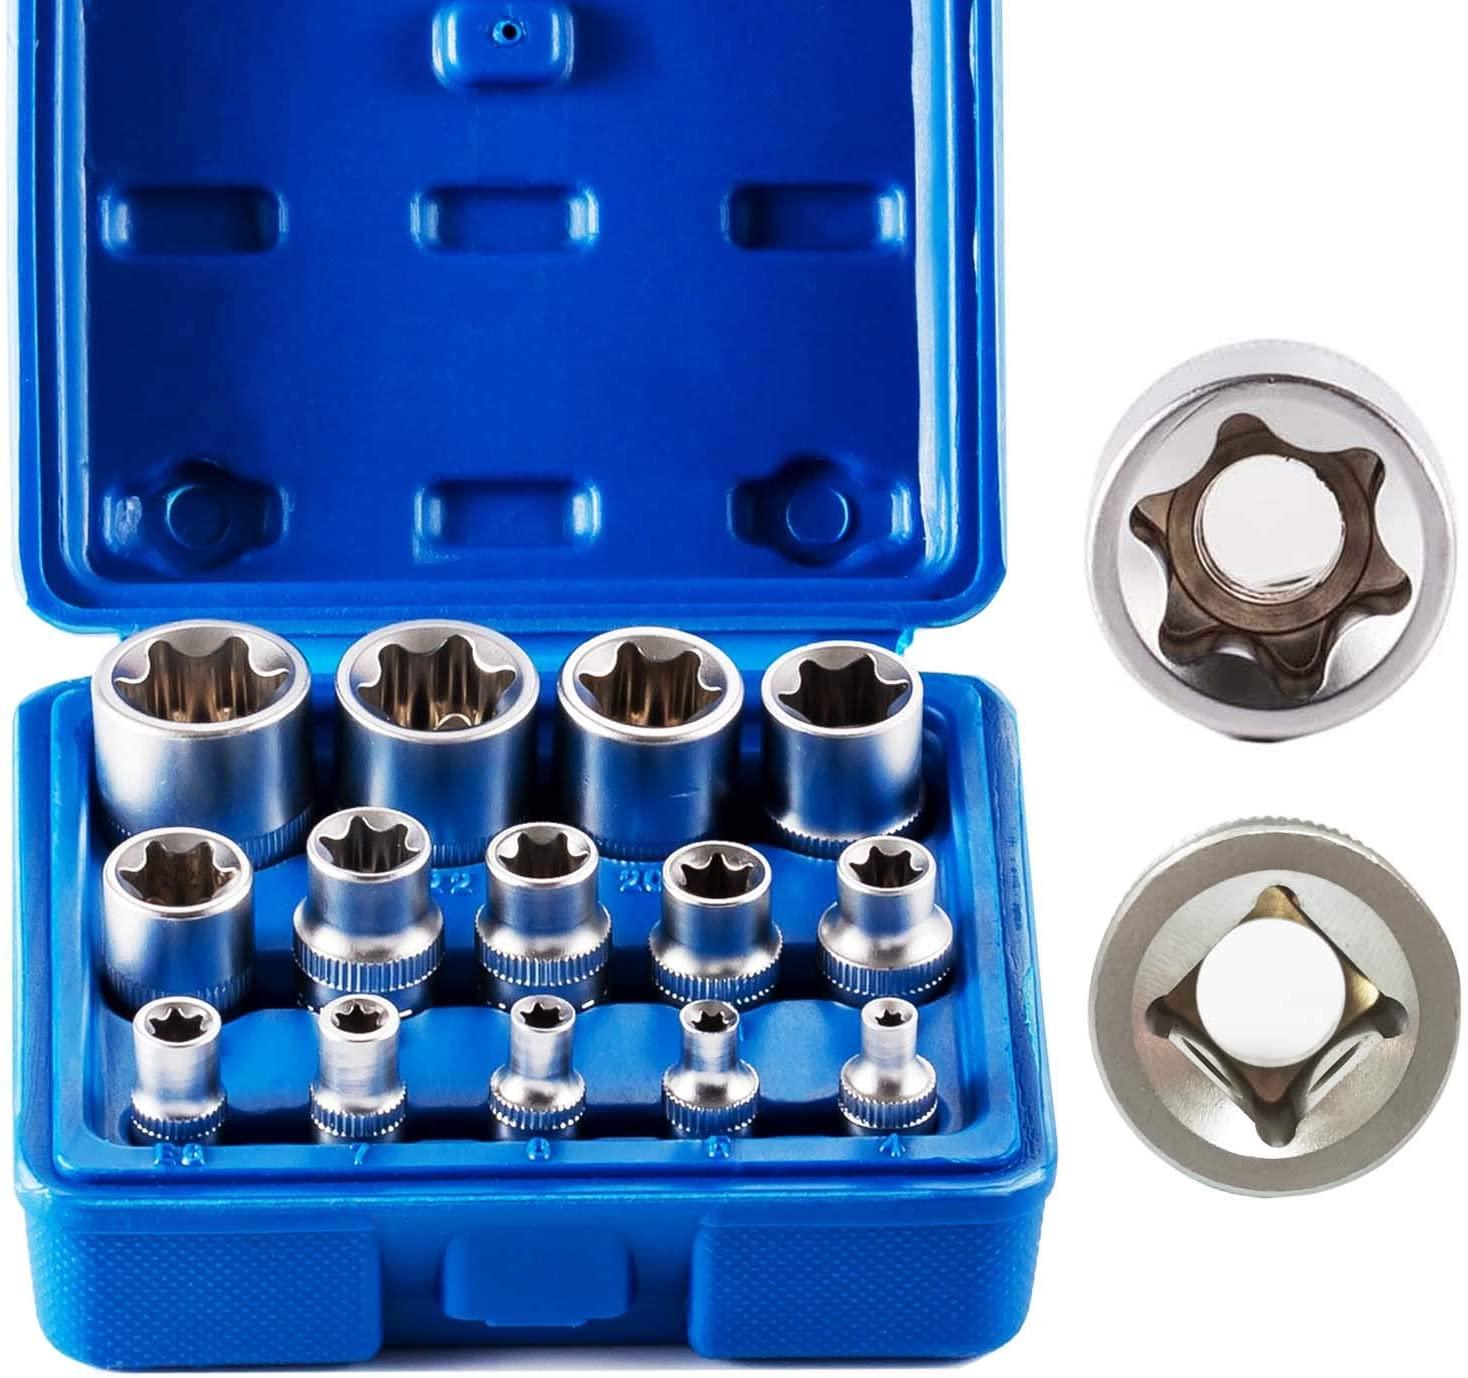 14PCS E Torx Star Female Bit Socket Set, E4 -E24 Female External Torque Star Socket Sets with Rail, 1/2